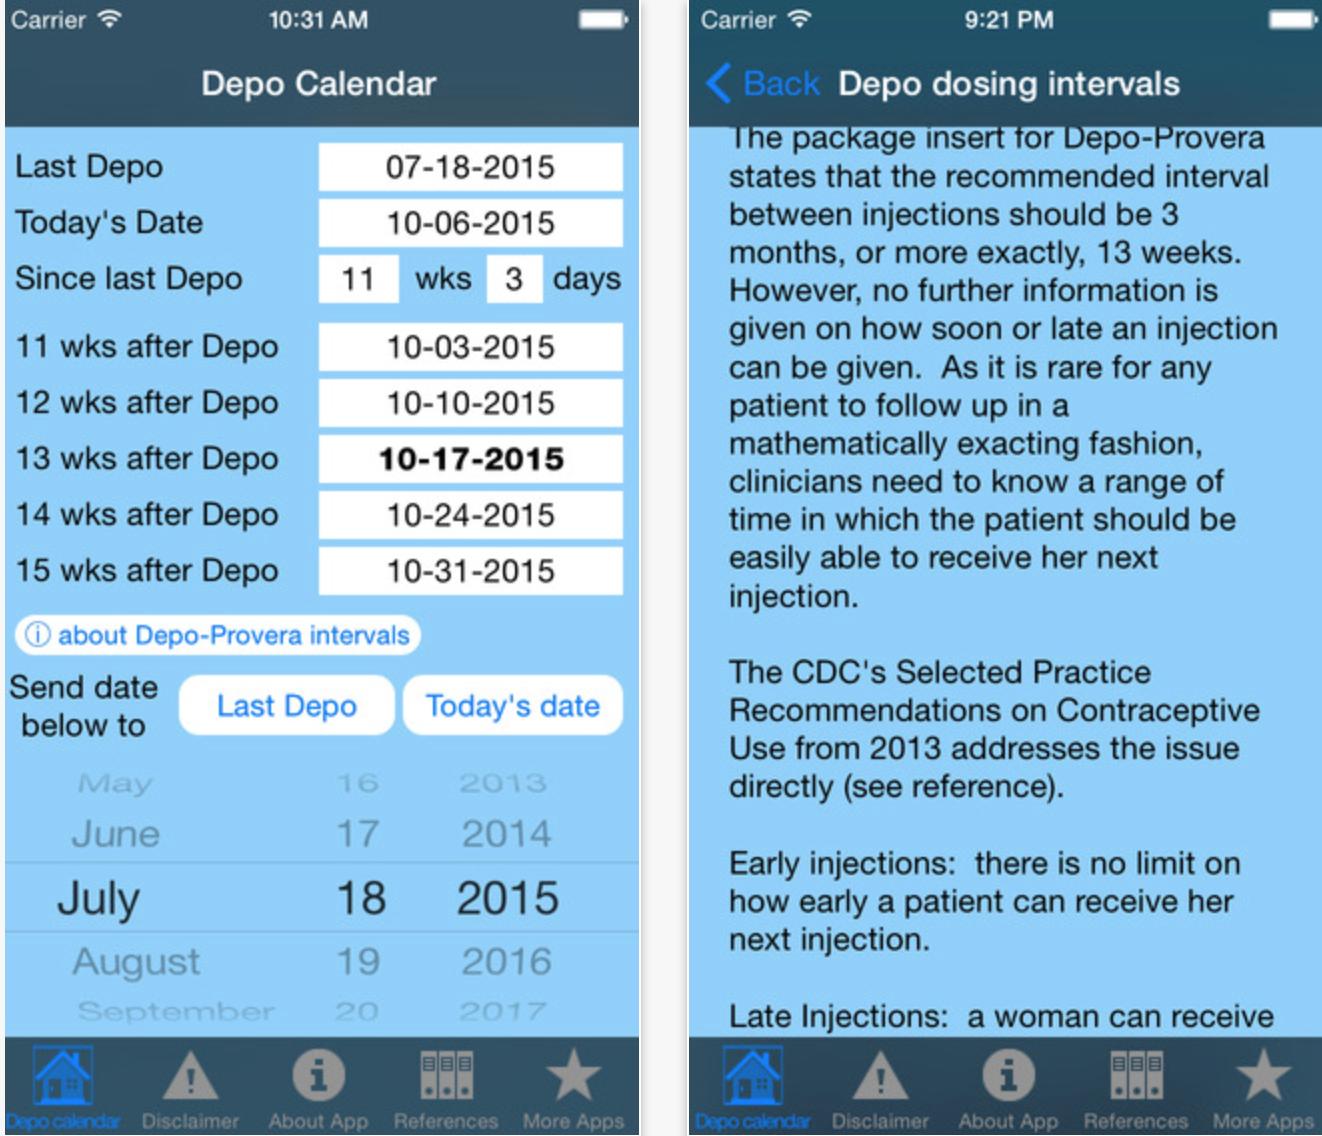 Depo Calendar App Could Significantly Improve Contraception regarding Depo-Provera Calculator